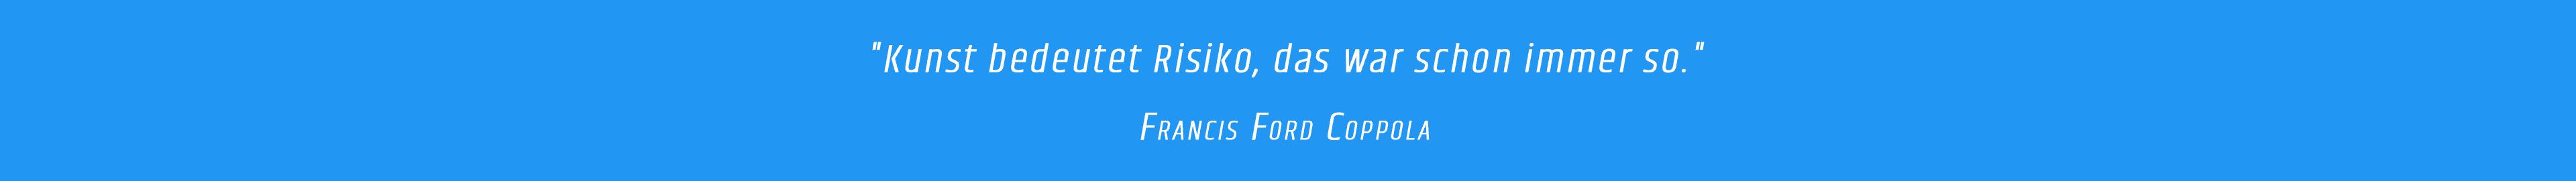 Zitat - Ford Coppola